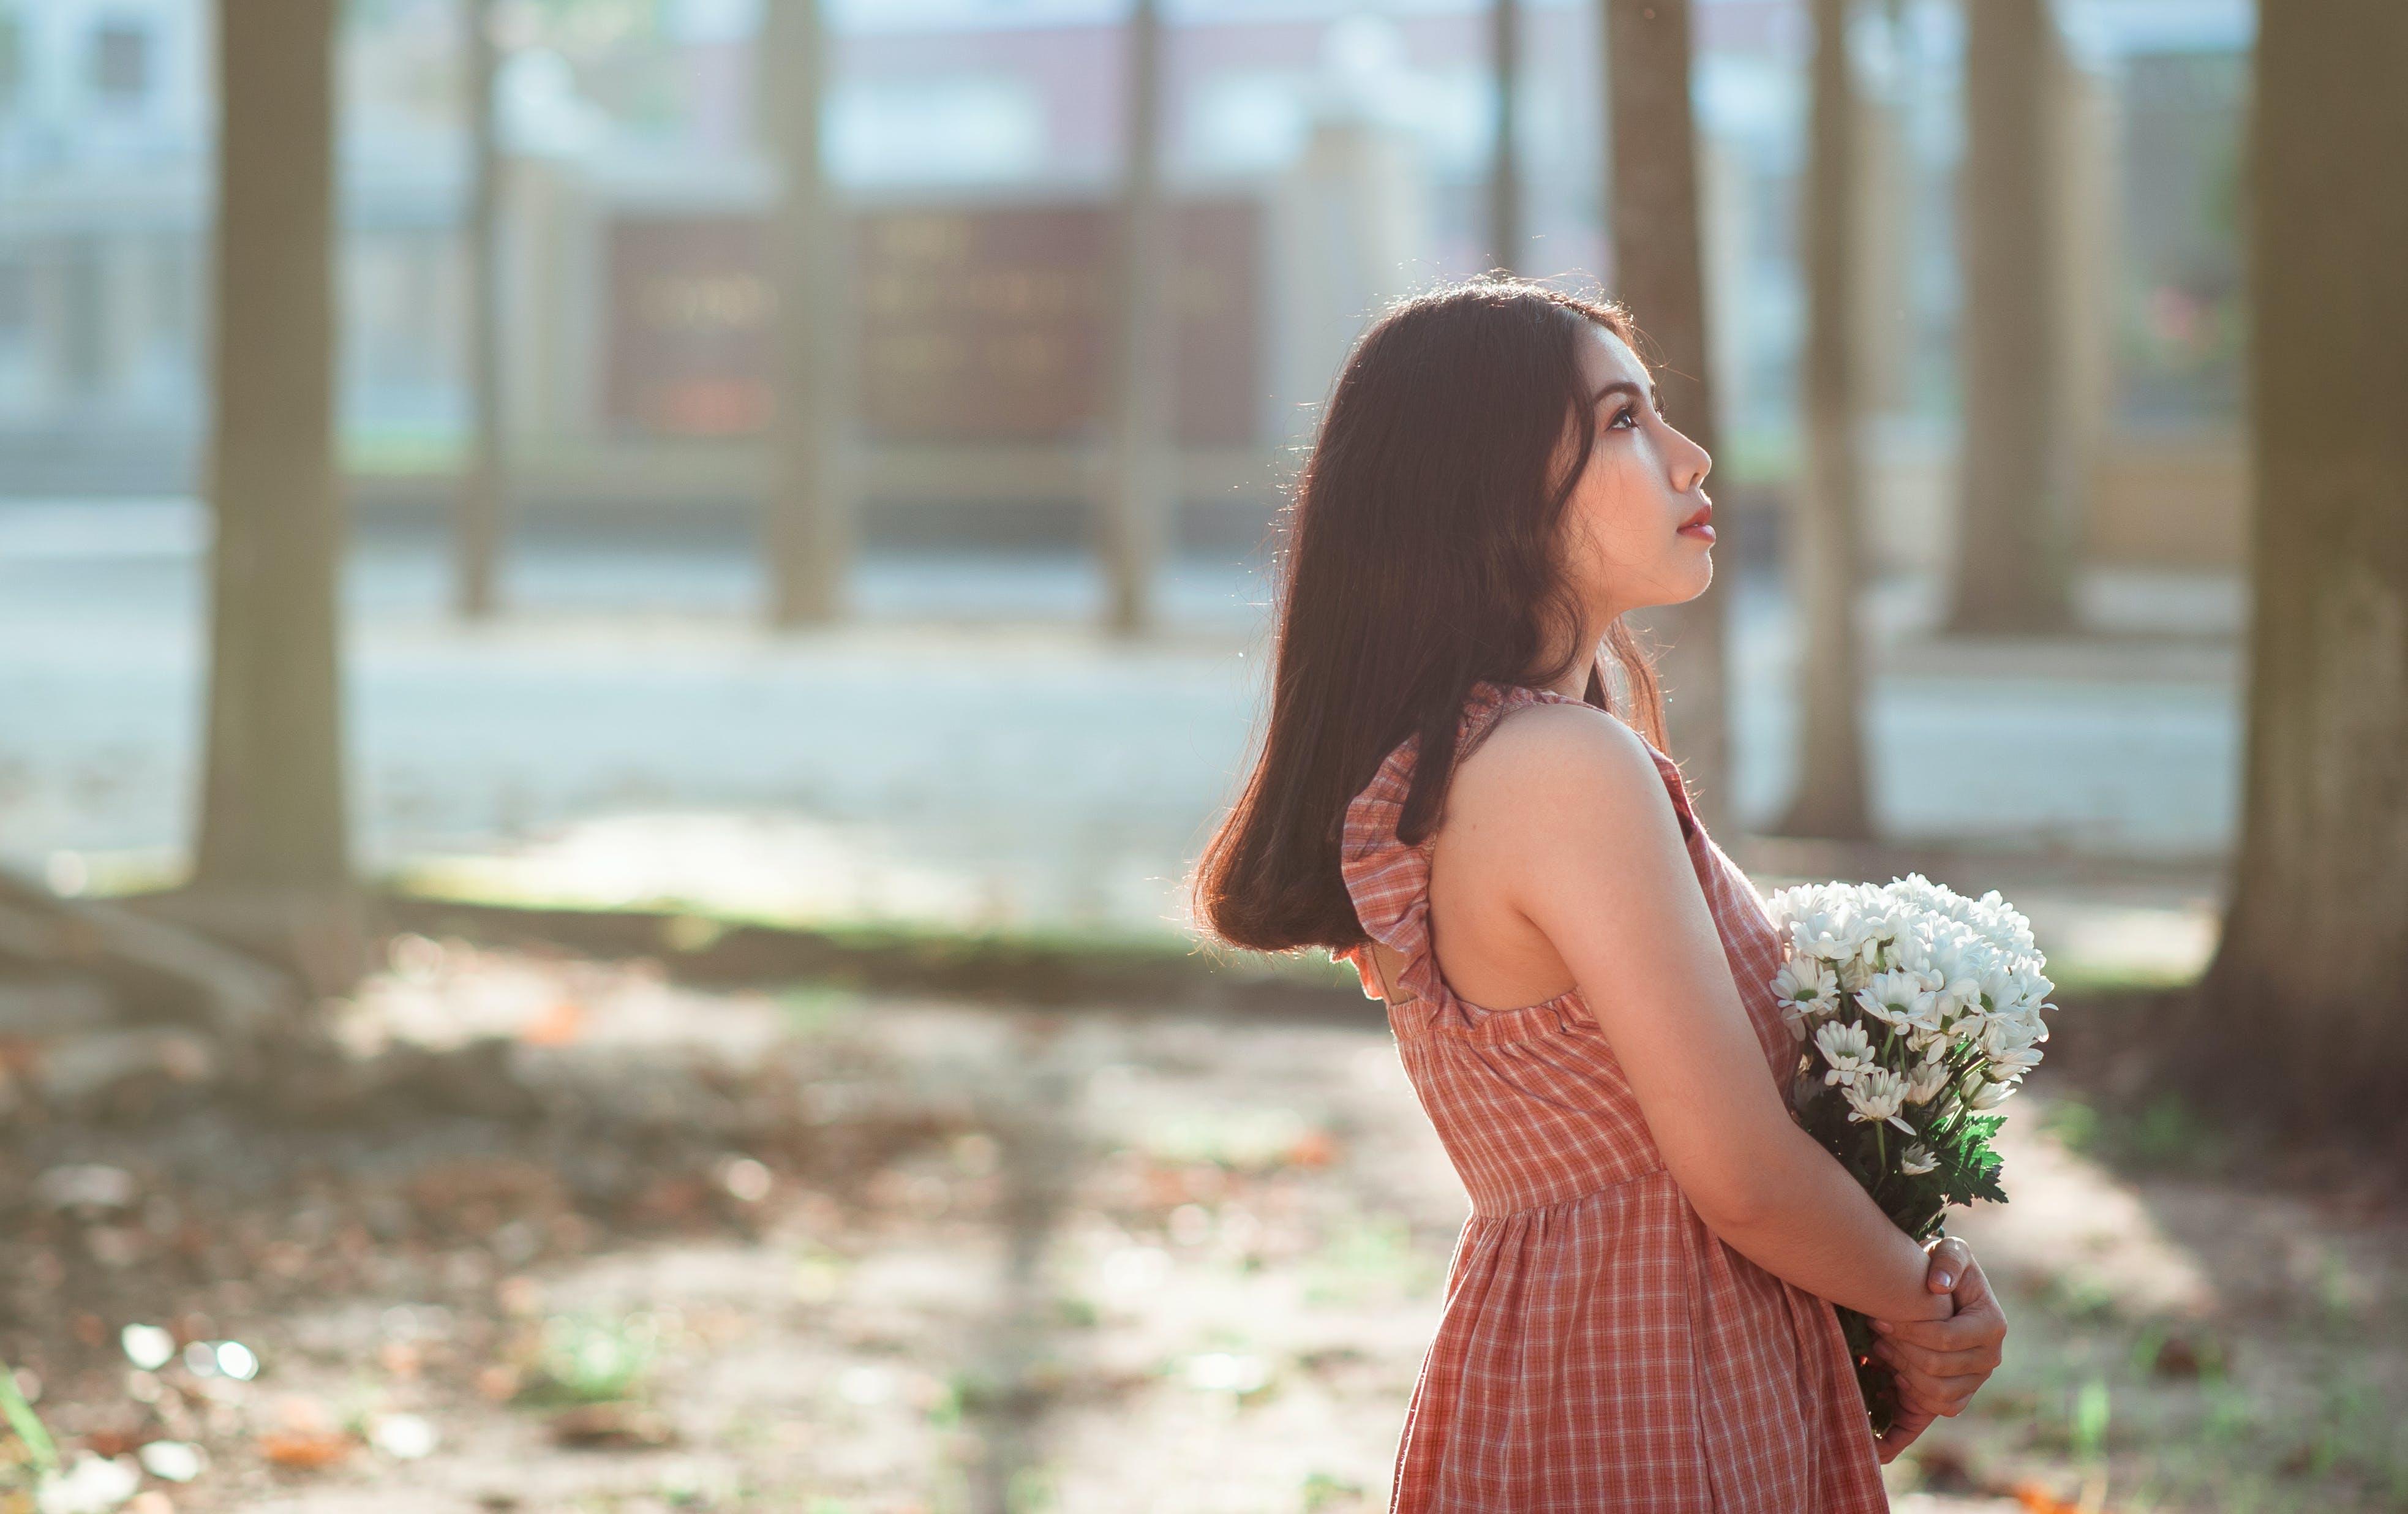 Woman Wearing Brown Sleeveless Dress Carrying White Flower Bouquet